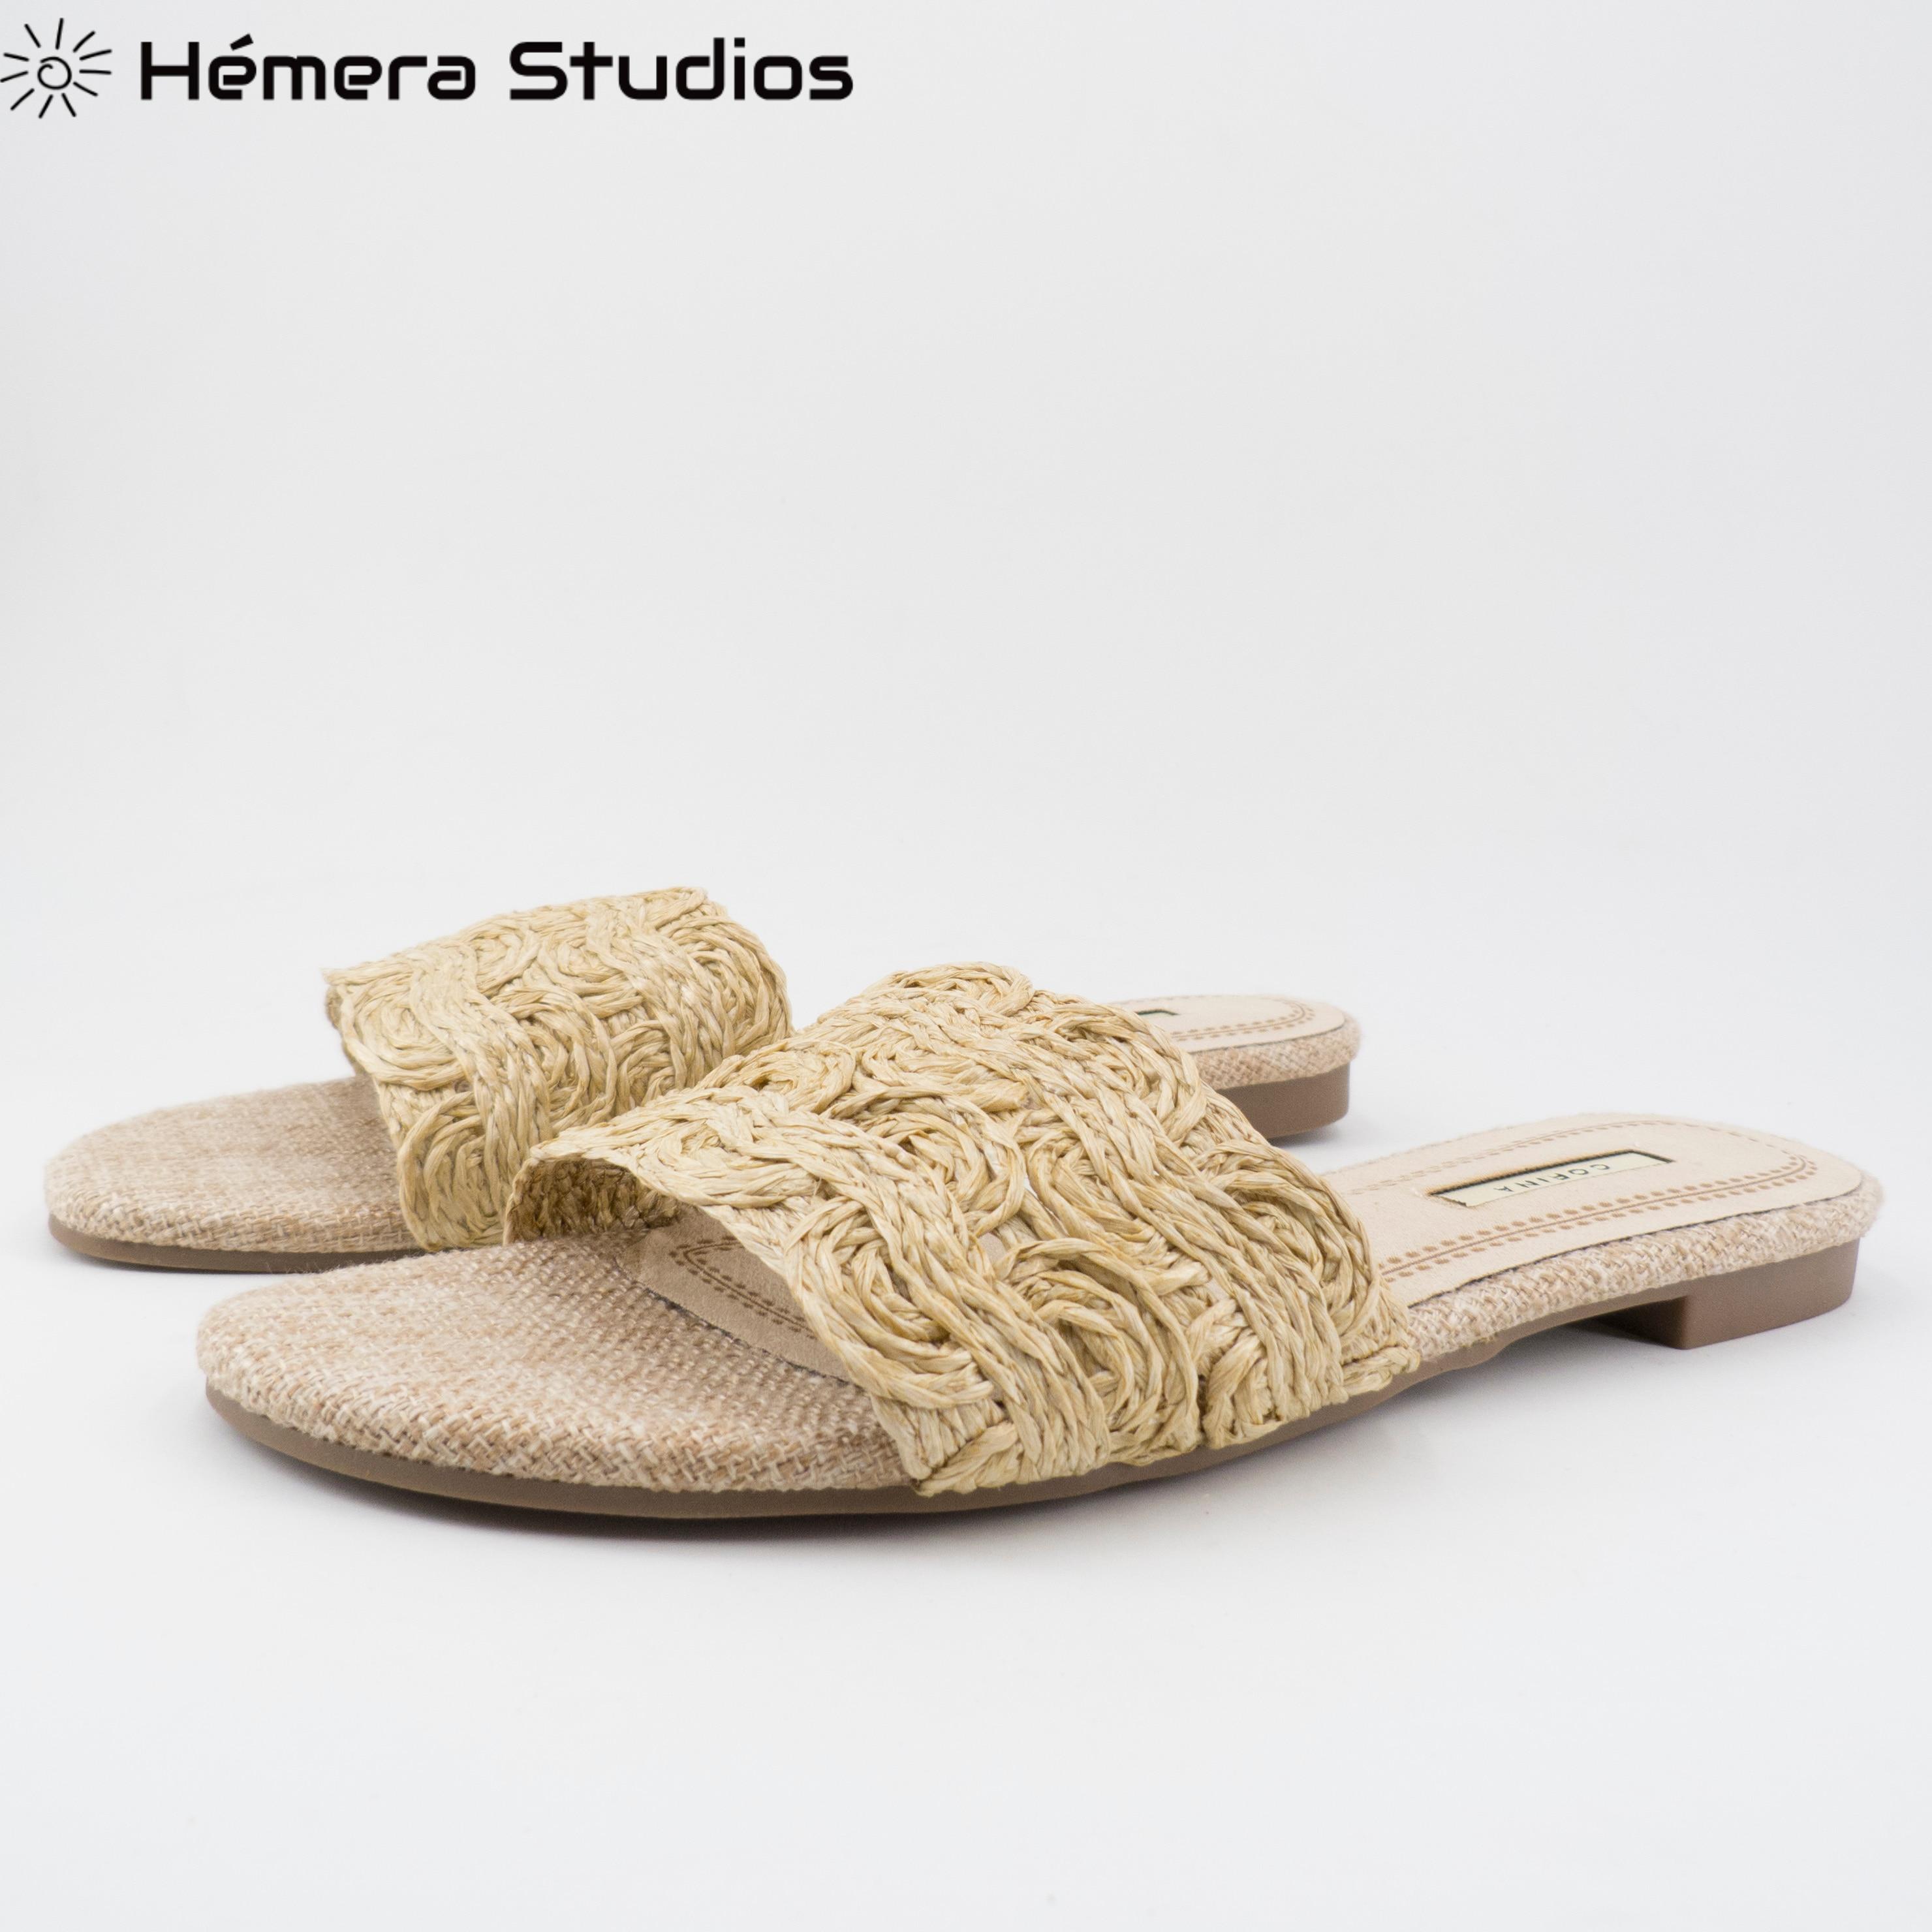 Sandalia mujer 2020 verano natural con tira ancha trenzada playa casual estilo roma comodas combinable cómodas